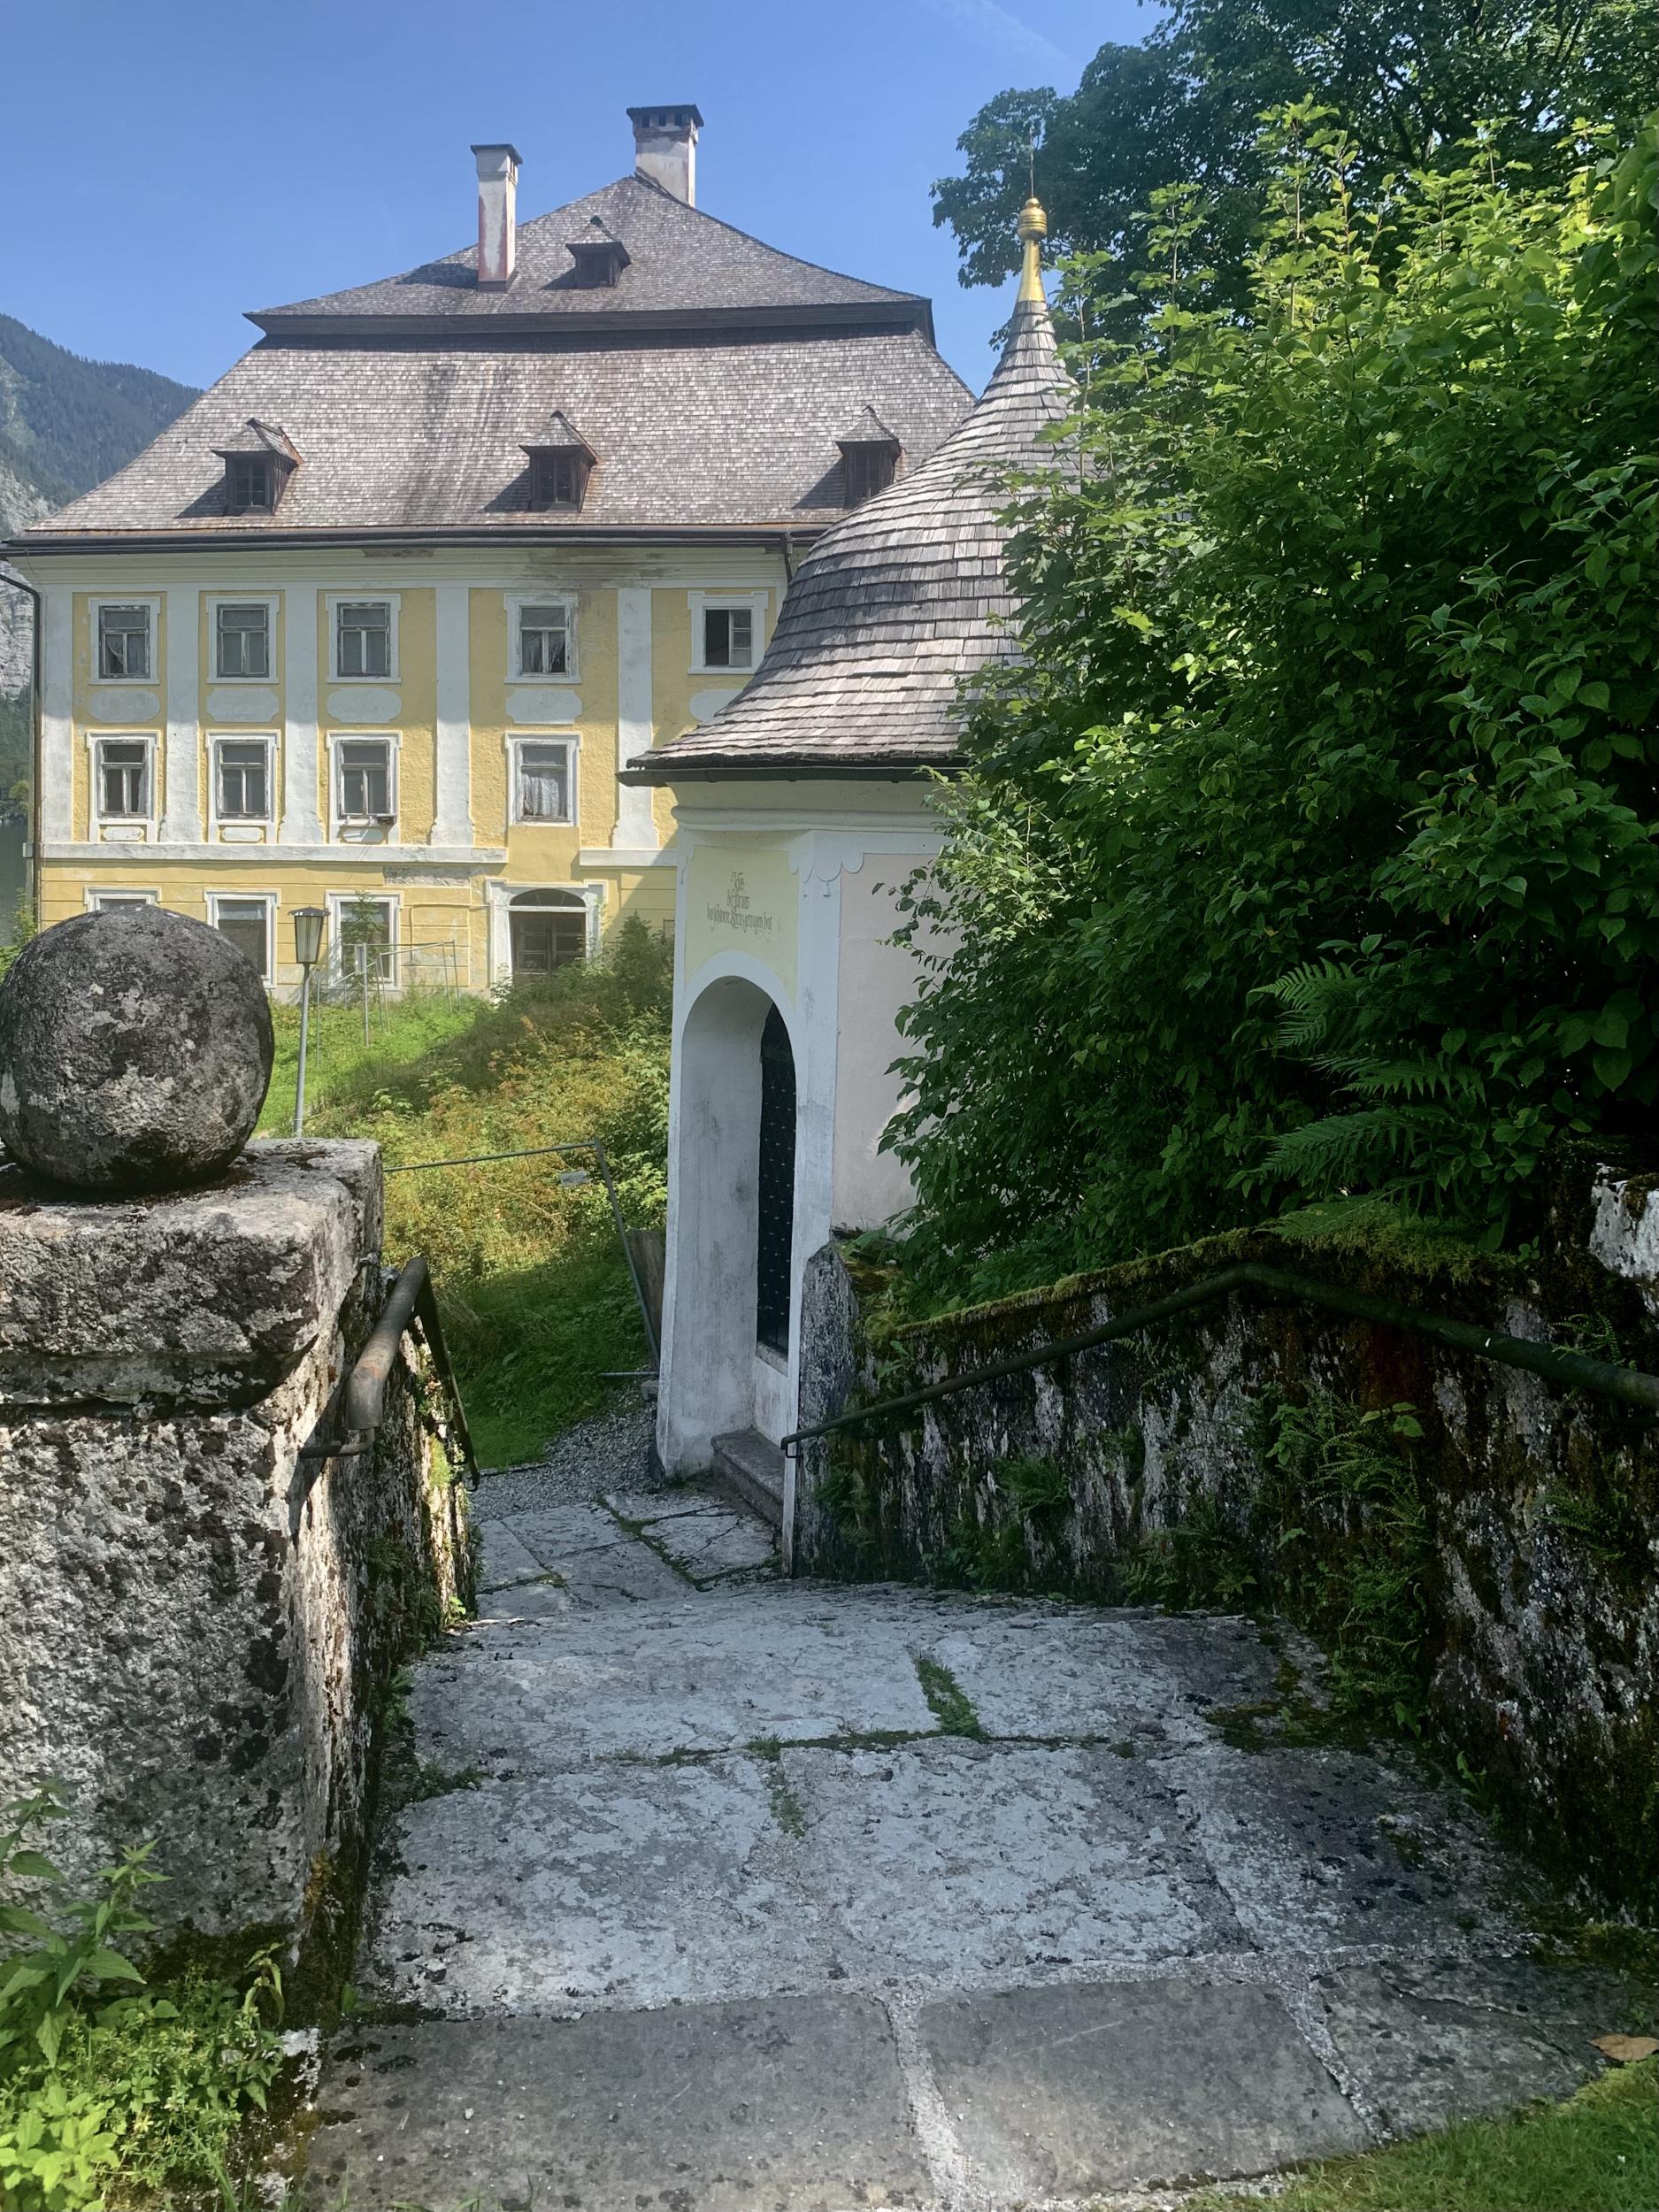 Salinengebäude und Kreuzwegkapelle in Hallstatt